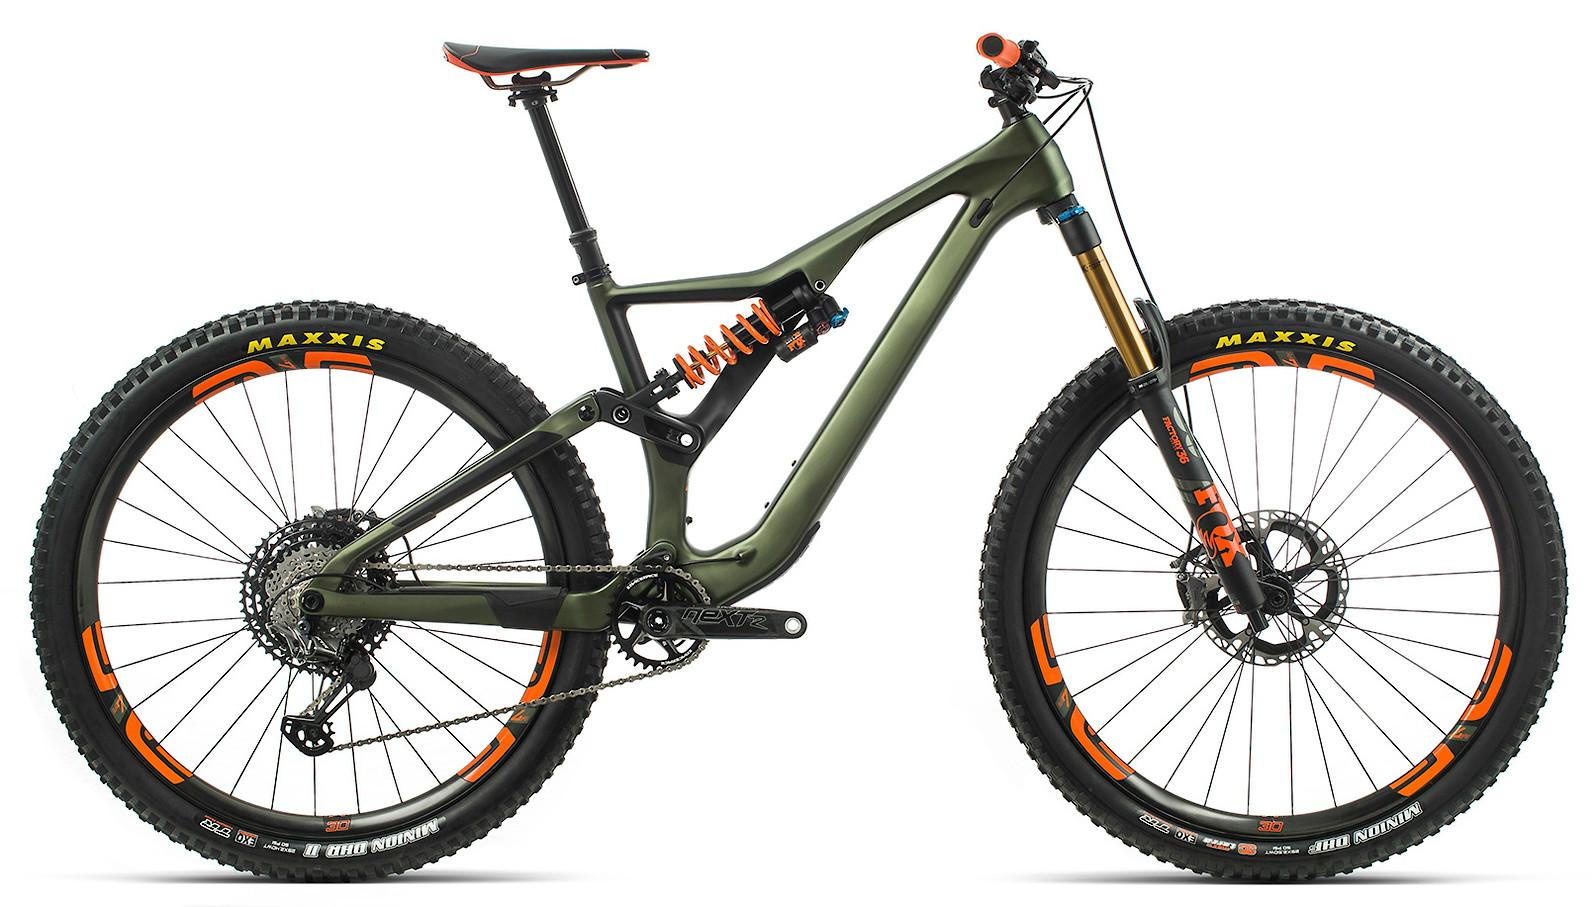 2020 Orbea Rallon M-LTD in green/orange